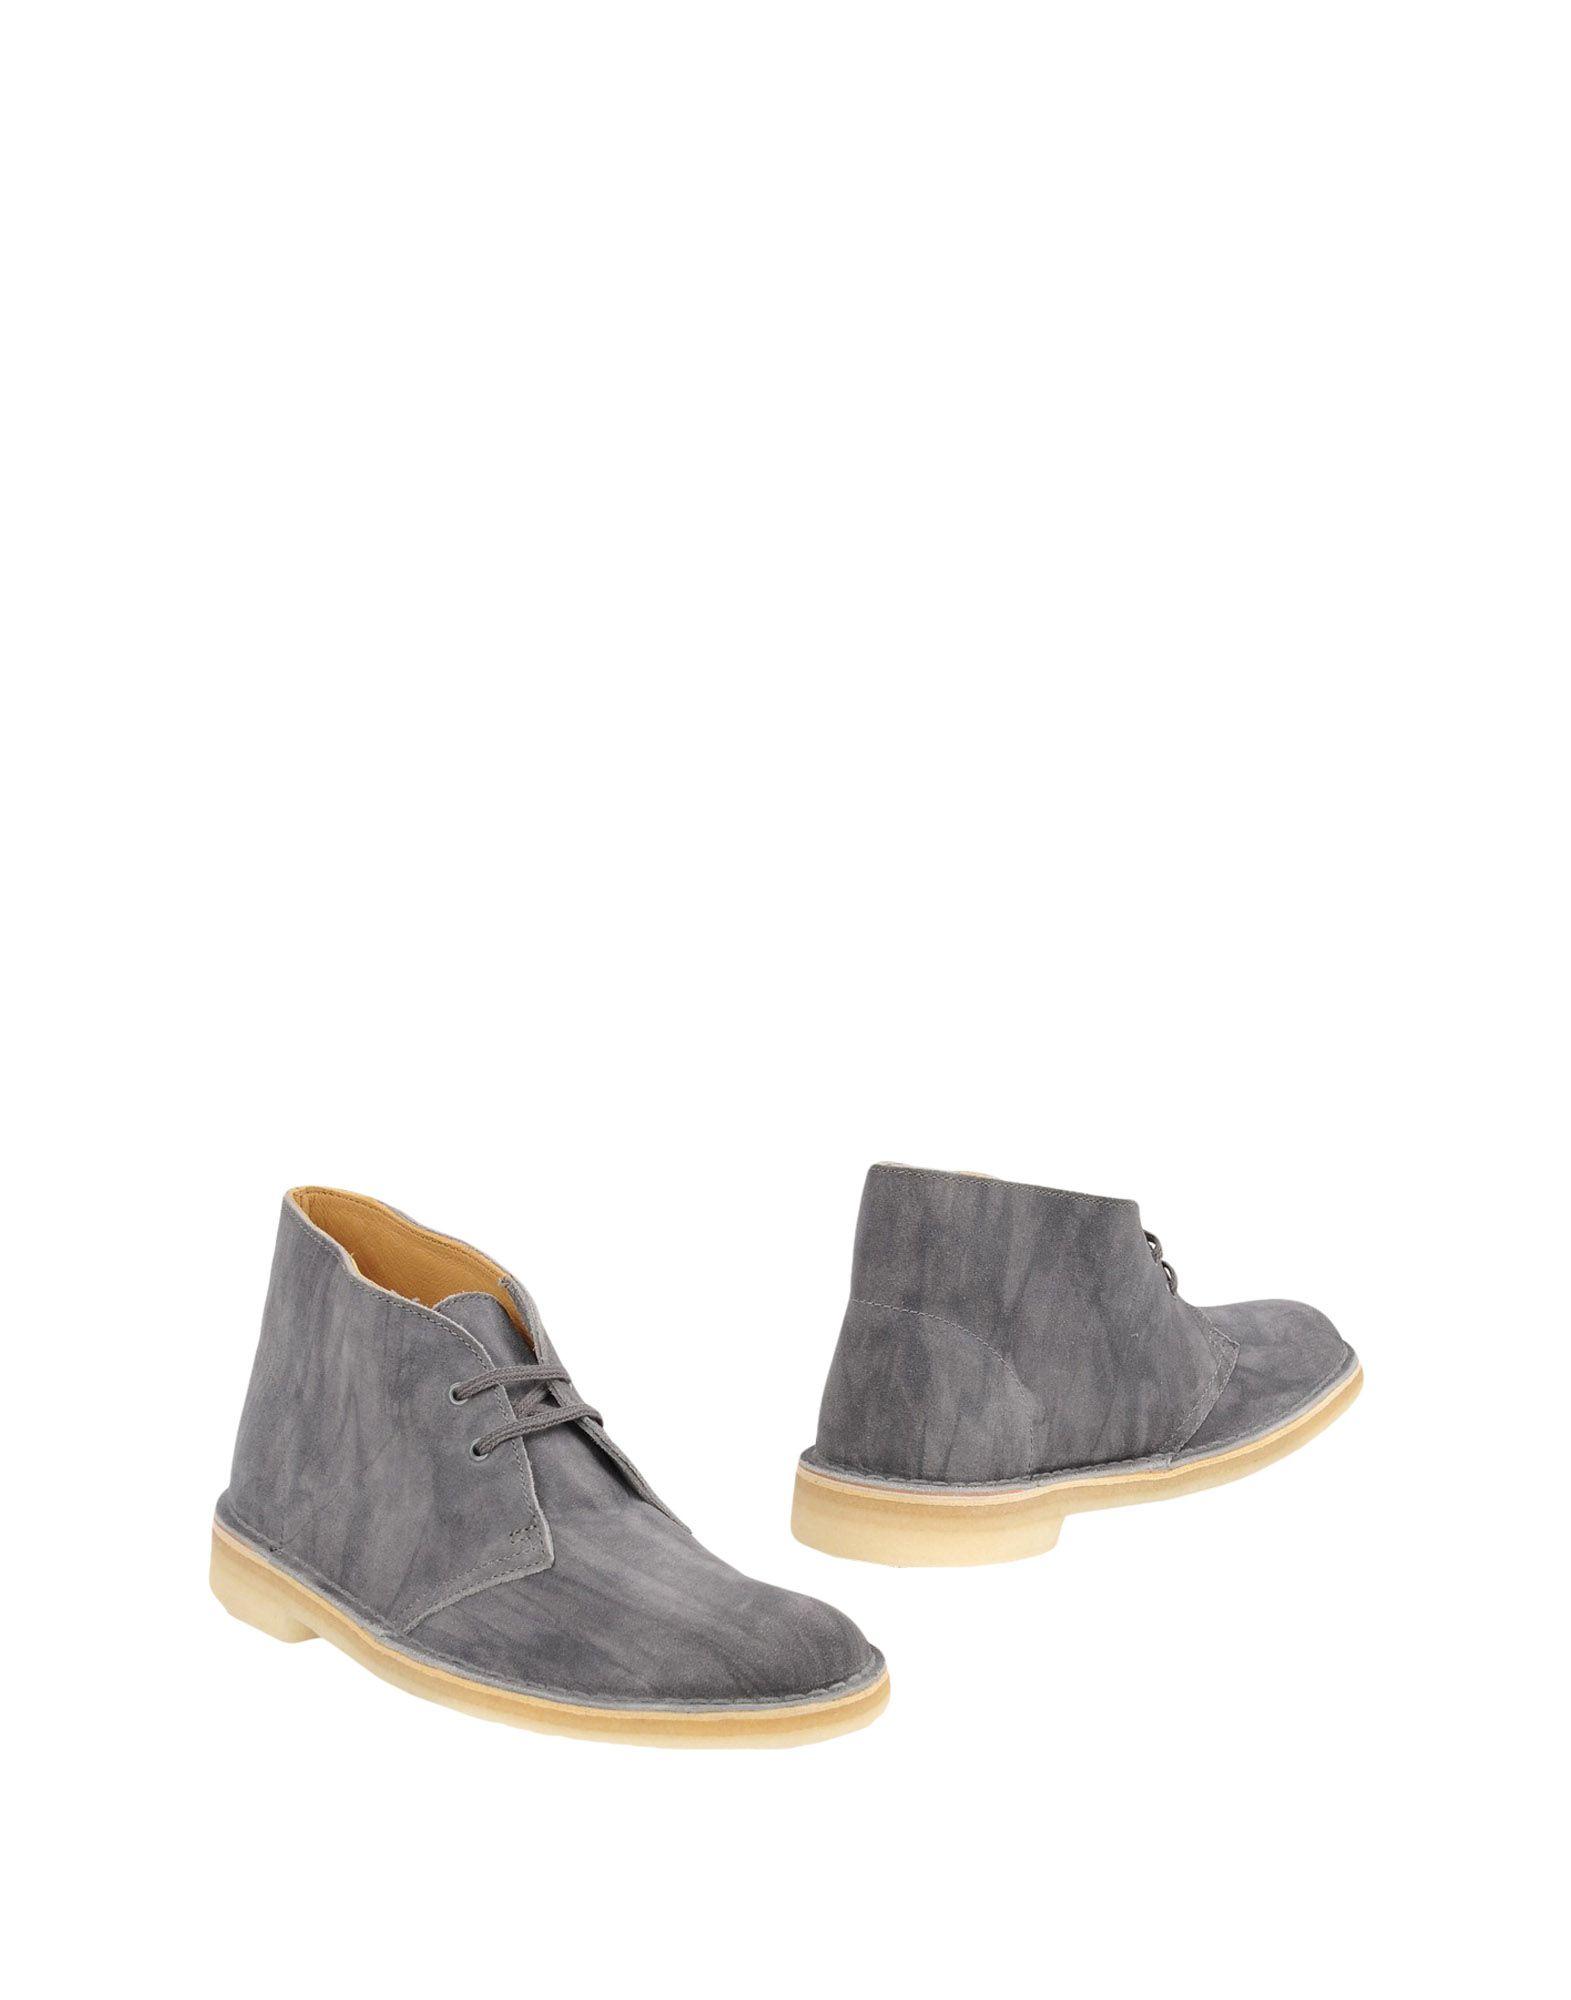 Stivaletti Clarks Desert Boot - Donna - 11338492NP